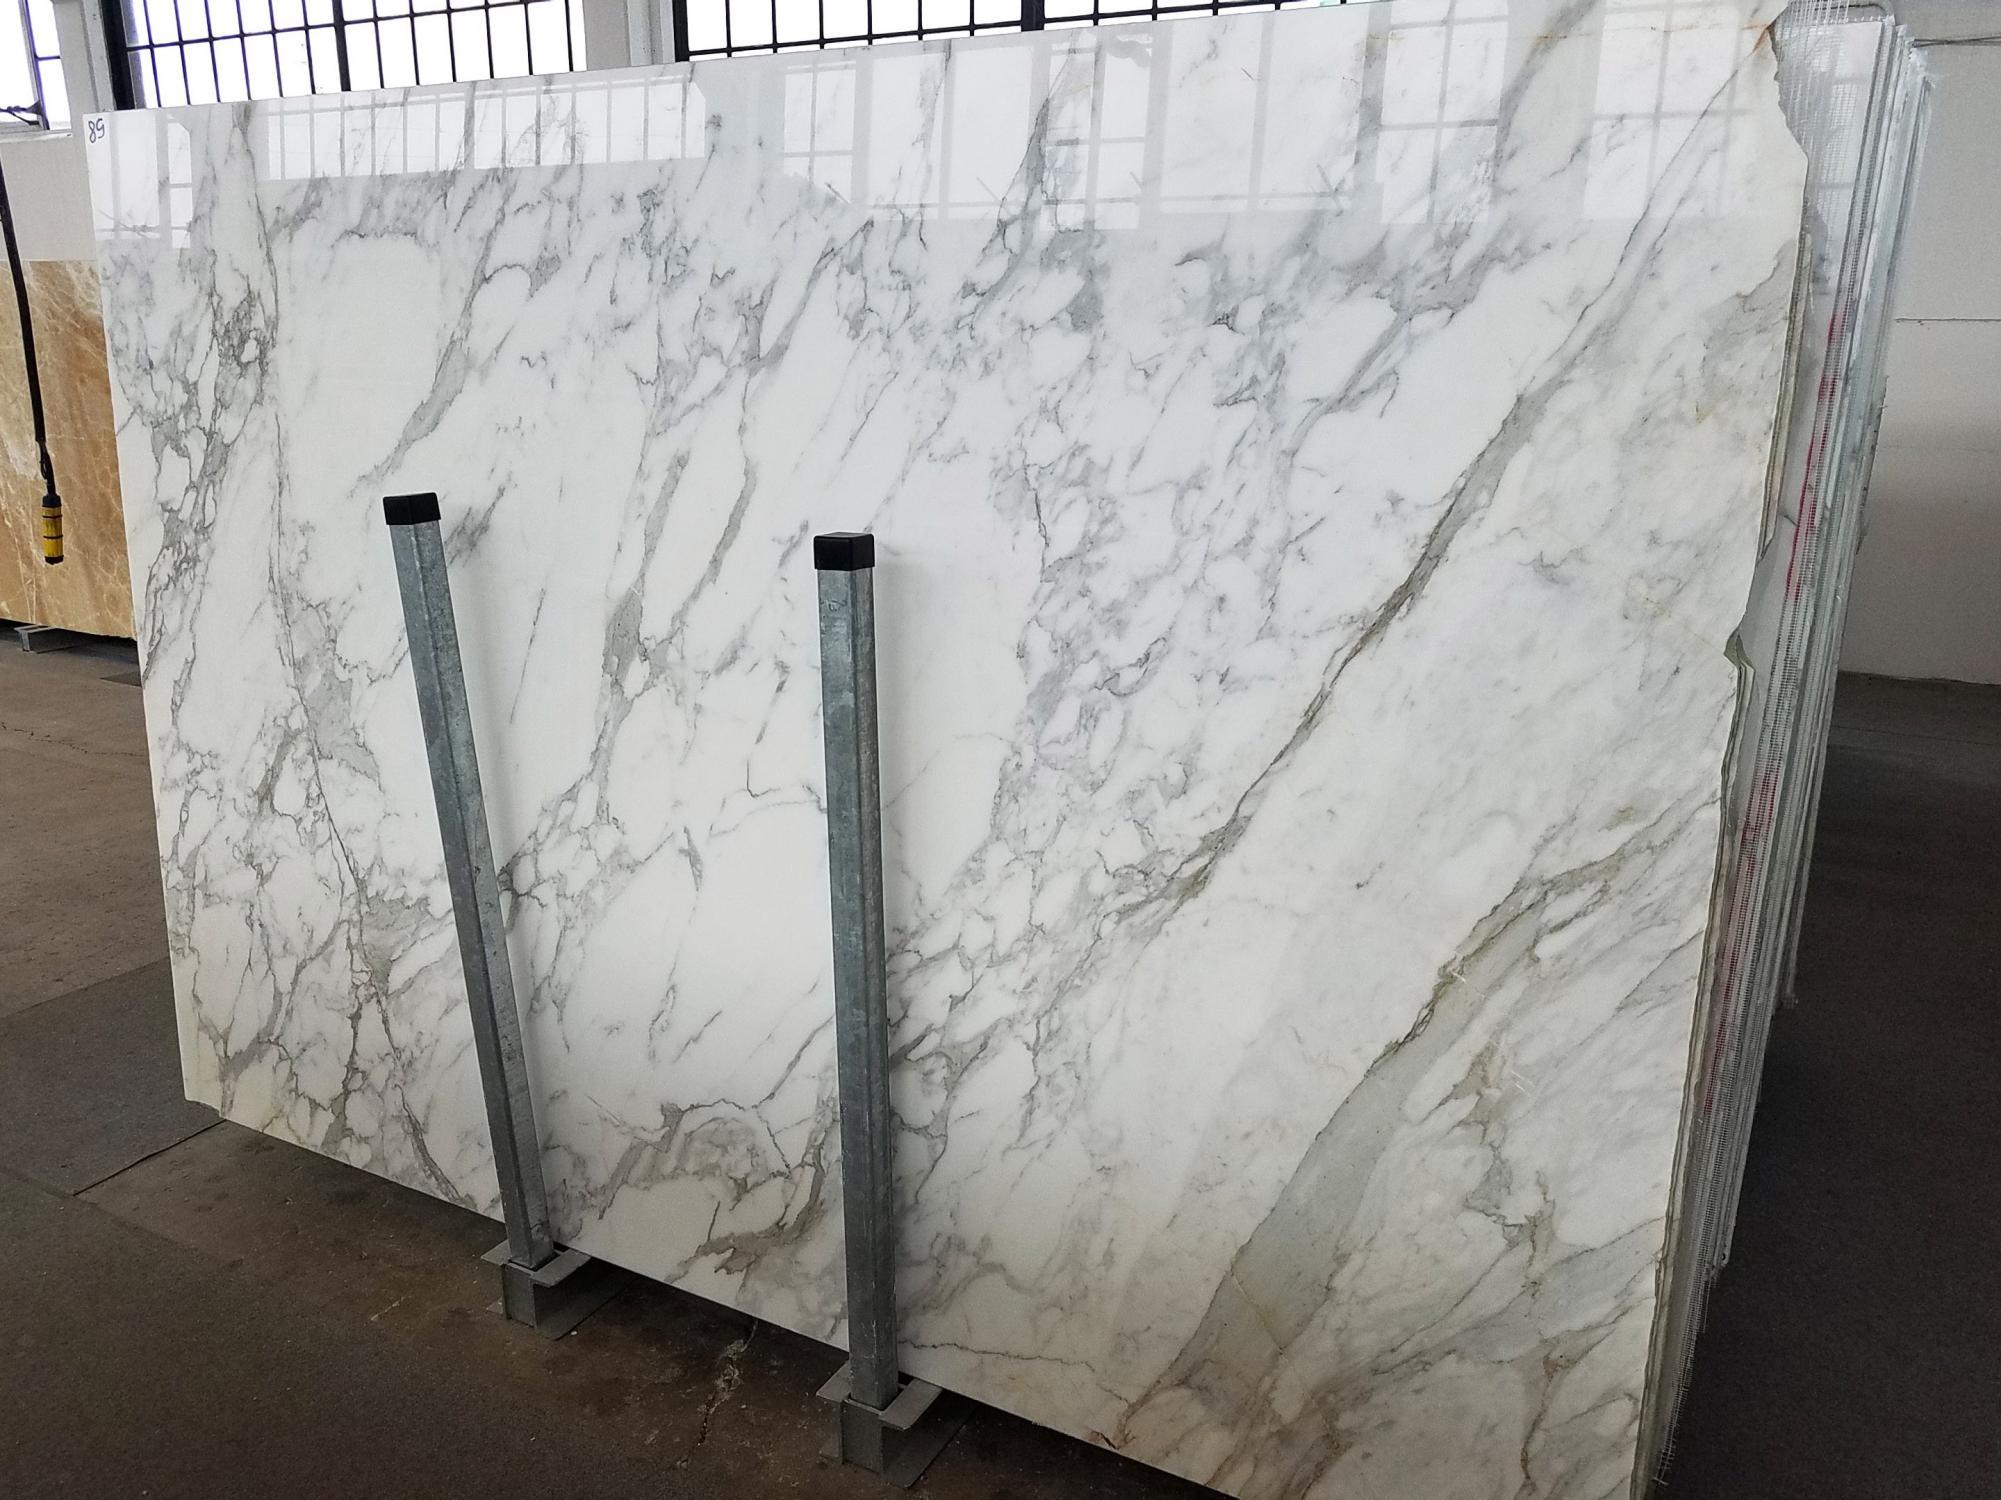 CALACATTA Suministro Veneto (Italia) de planchas pulidas en mármol natural A0256 , SL2